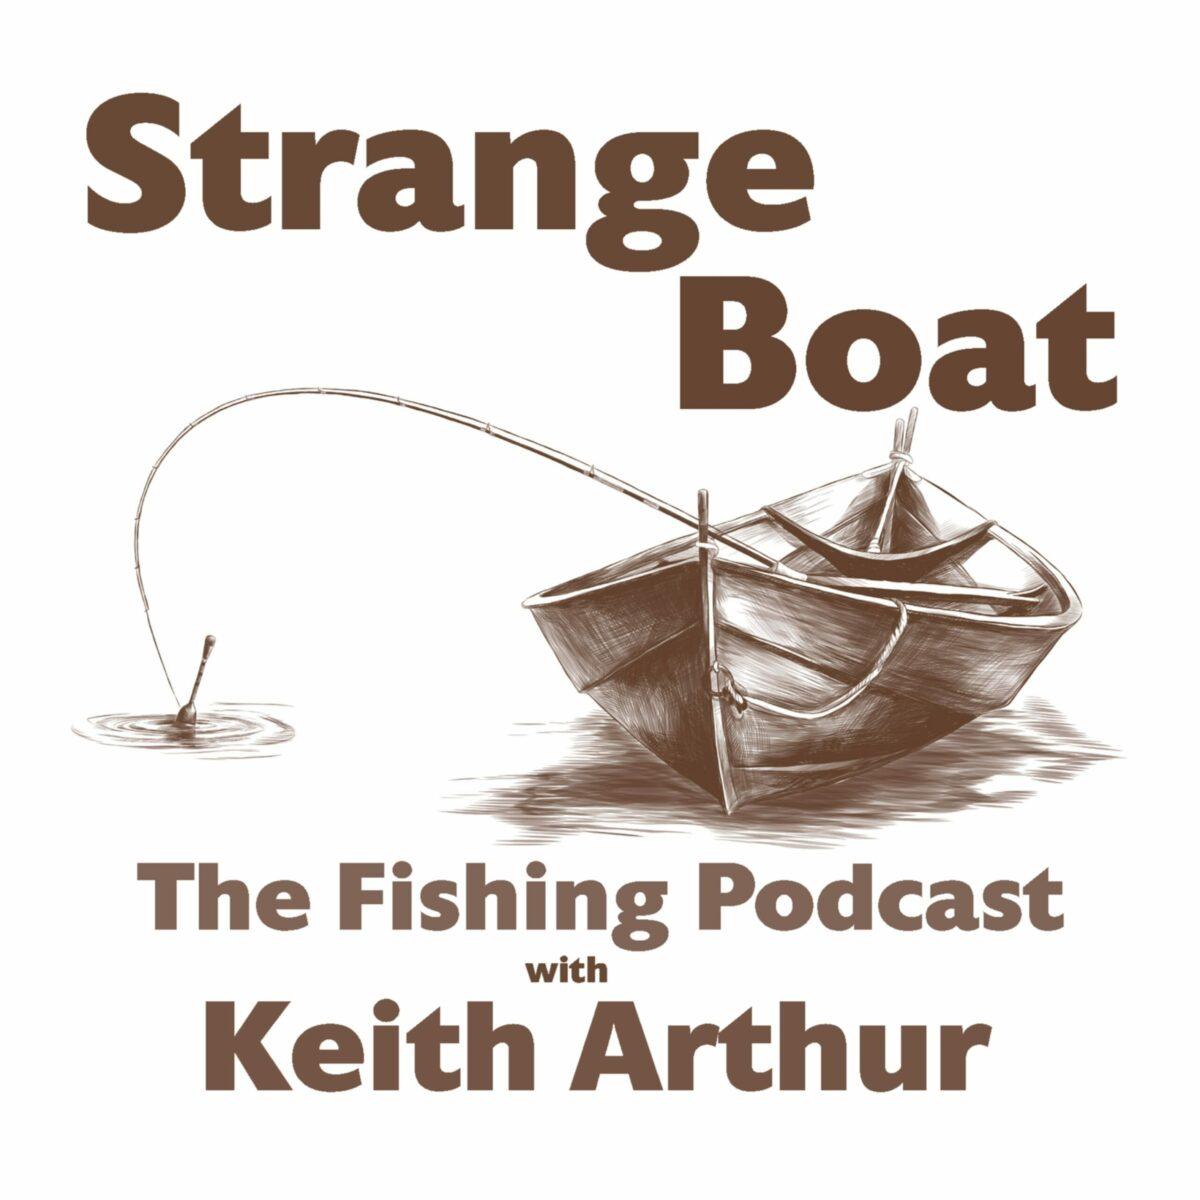 Strange Boat - The Fishing Podcast 18: Emma Harrison - We Fish As One inspiration